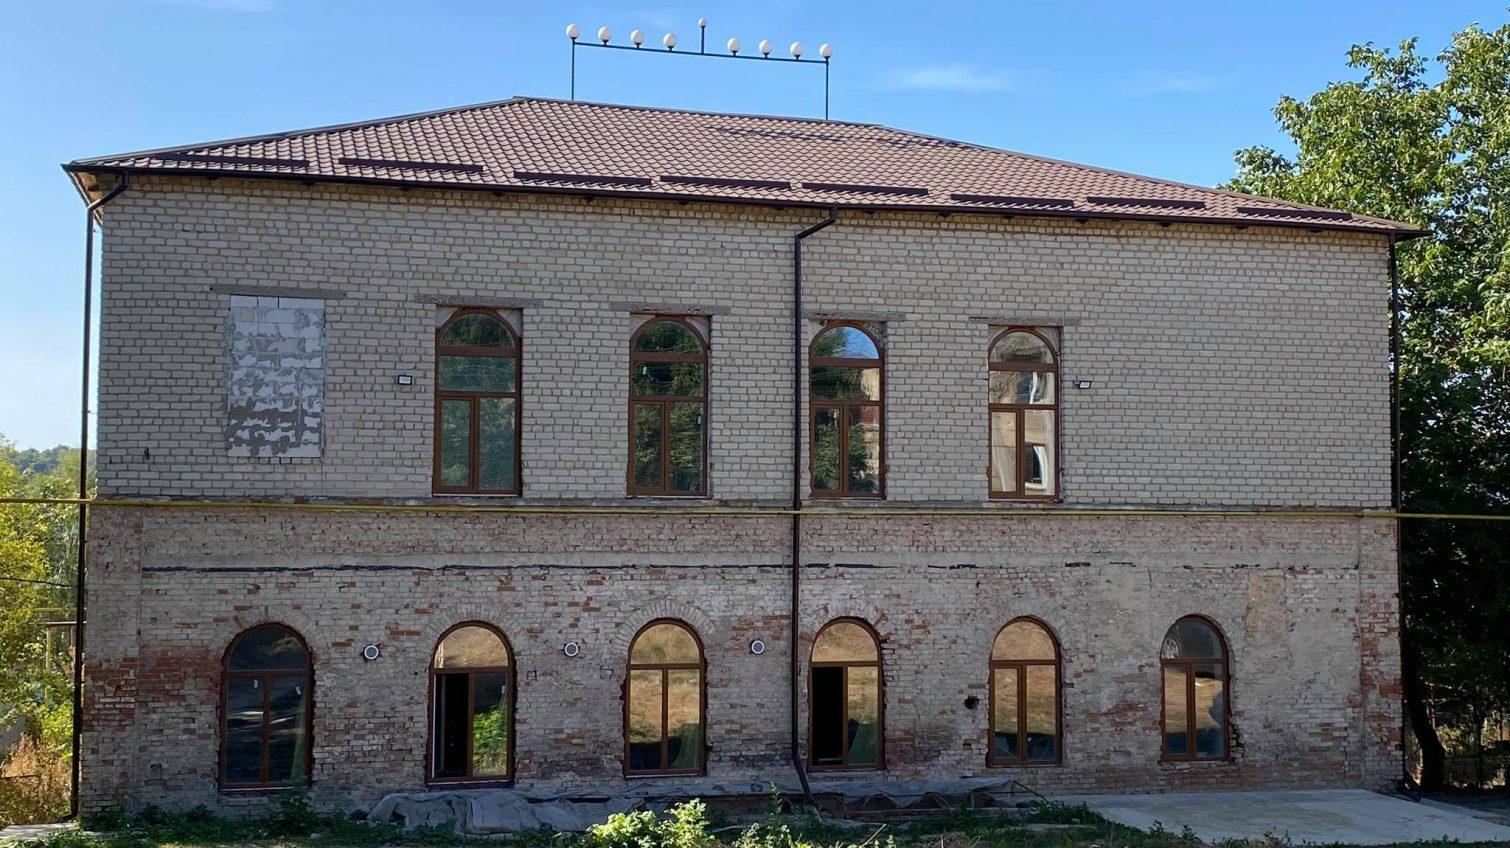 В Балте восстанавливают синагогу с музеем (фото) «фото»